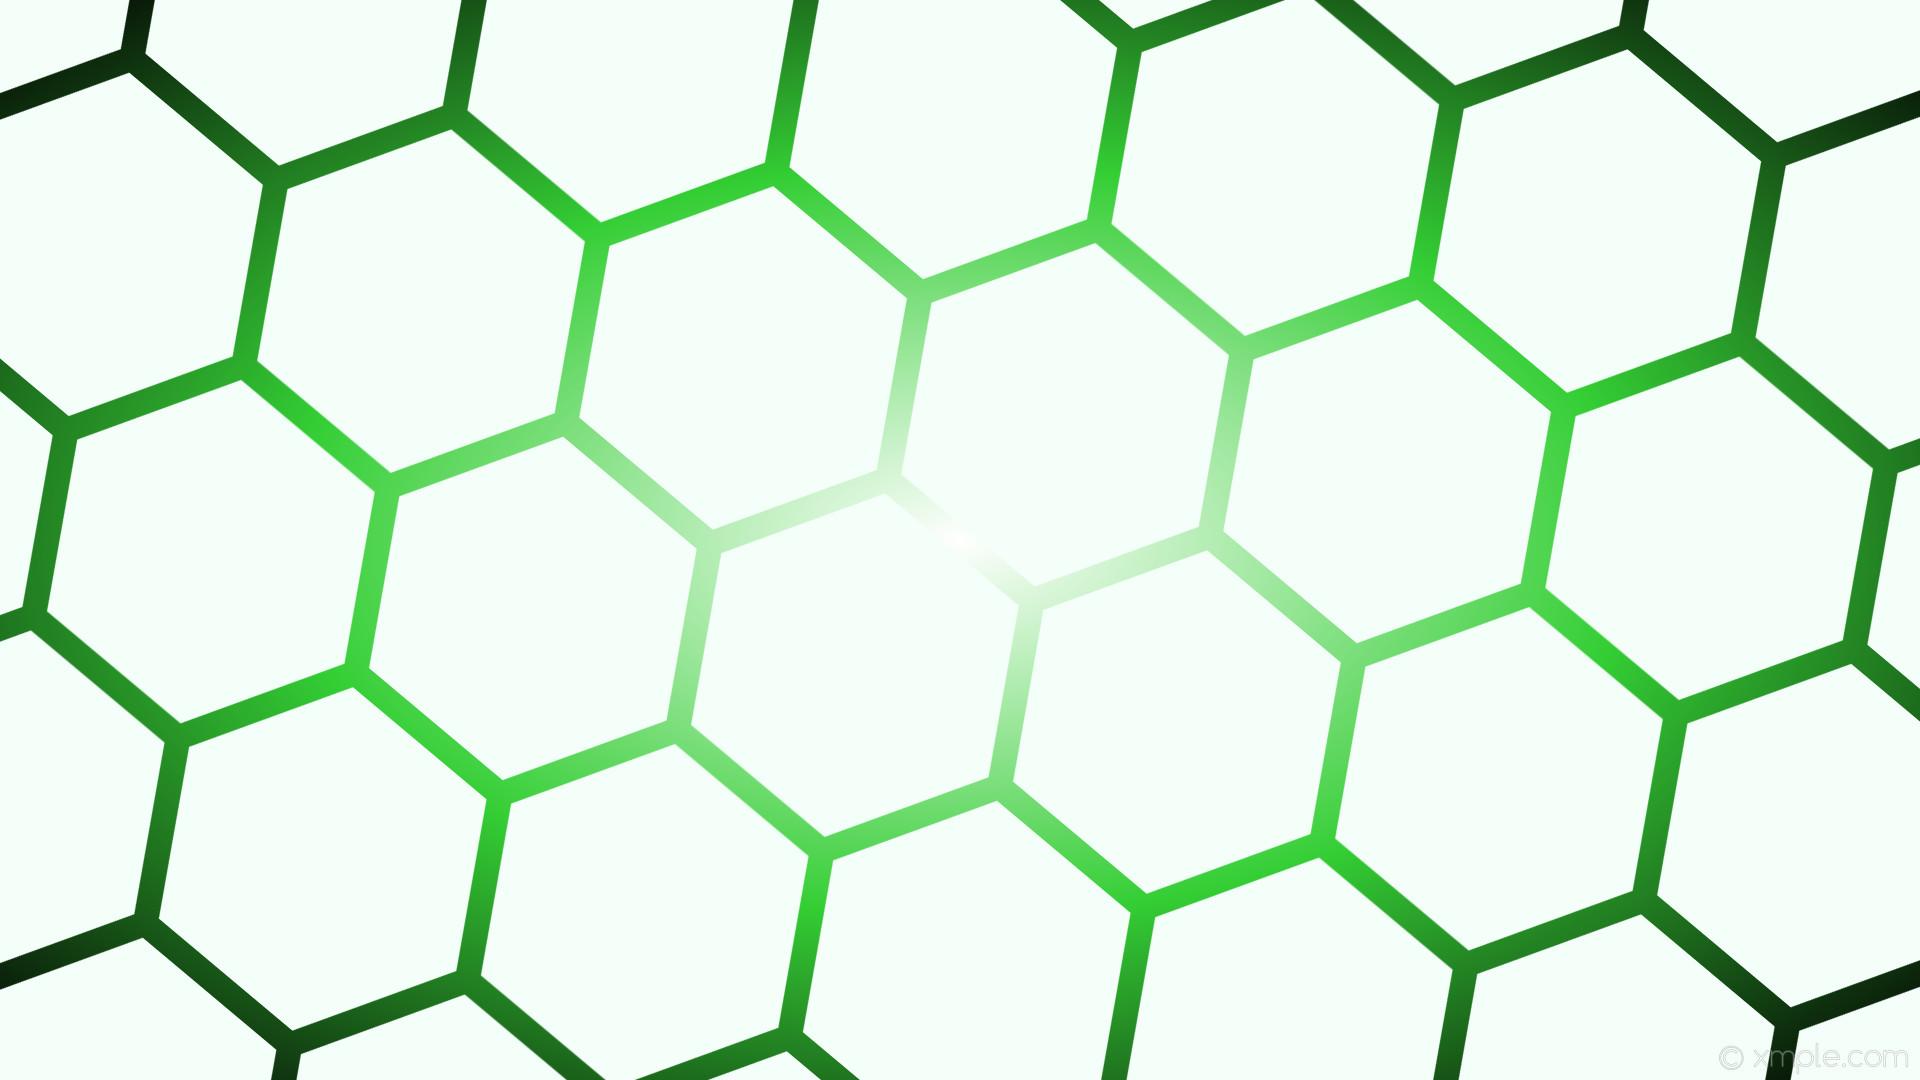 wallpaper glow gradient green black white hexagon mint cream lime green  #f5fffa #ffffff #